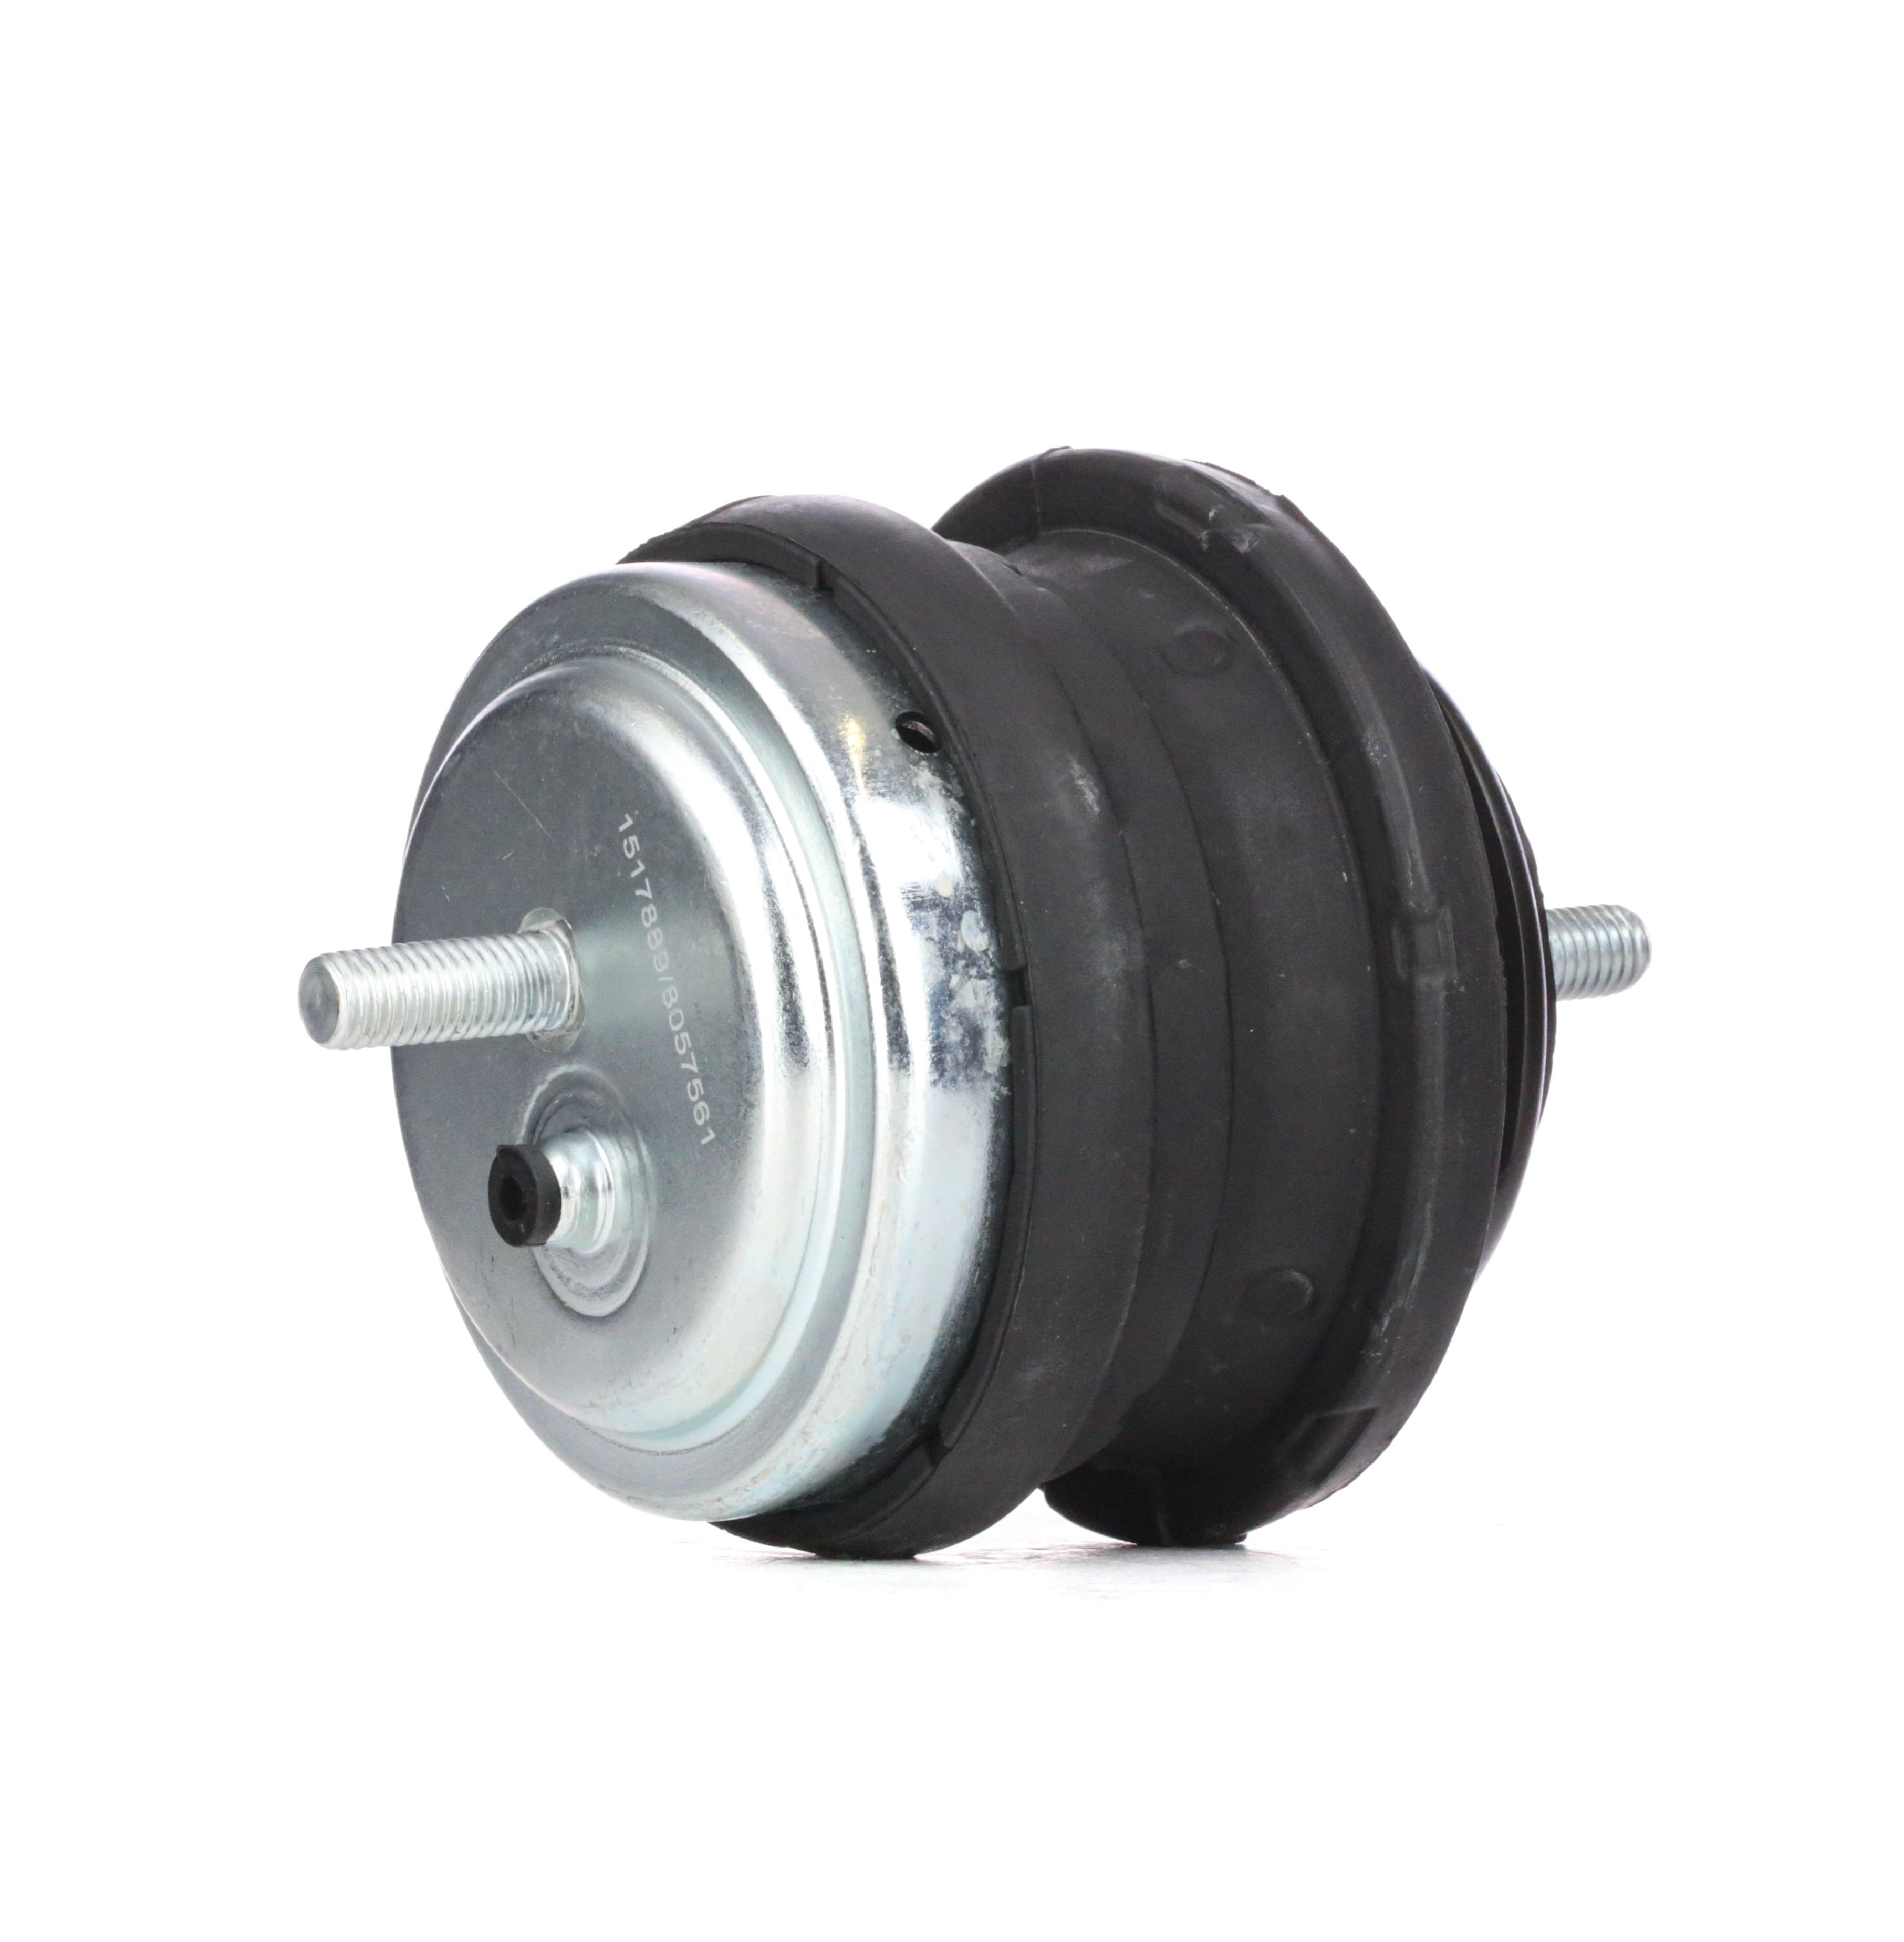 RIDEX: Original Motoraufhängung 247E0053 (Material: Gummi/Metall)